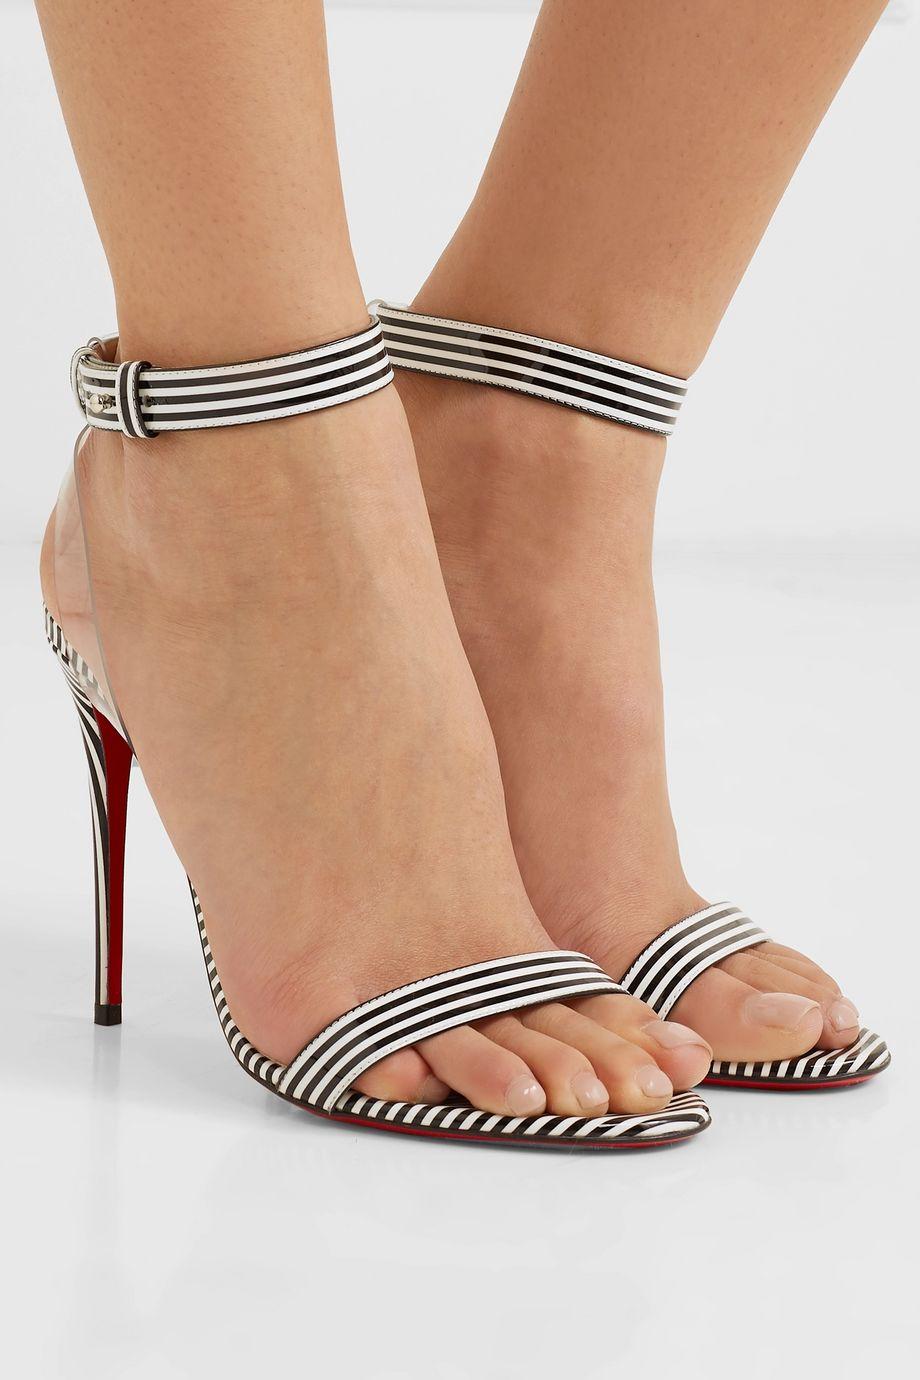 Christian Louboutin Jonatina 100 PVC-trimmed striped patent-leather sandals